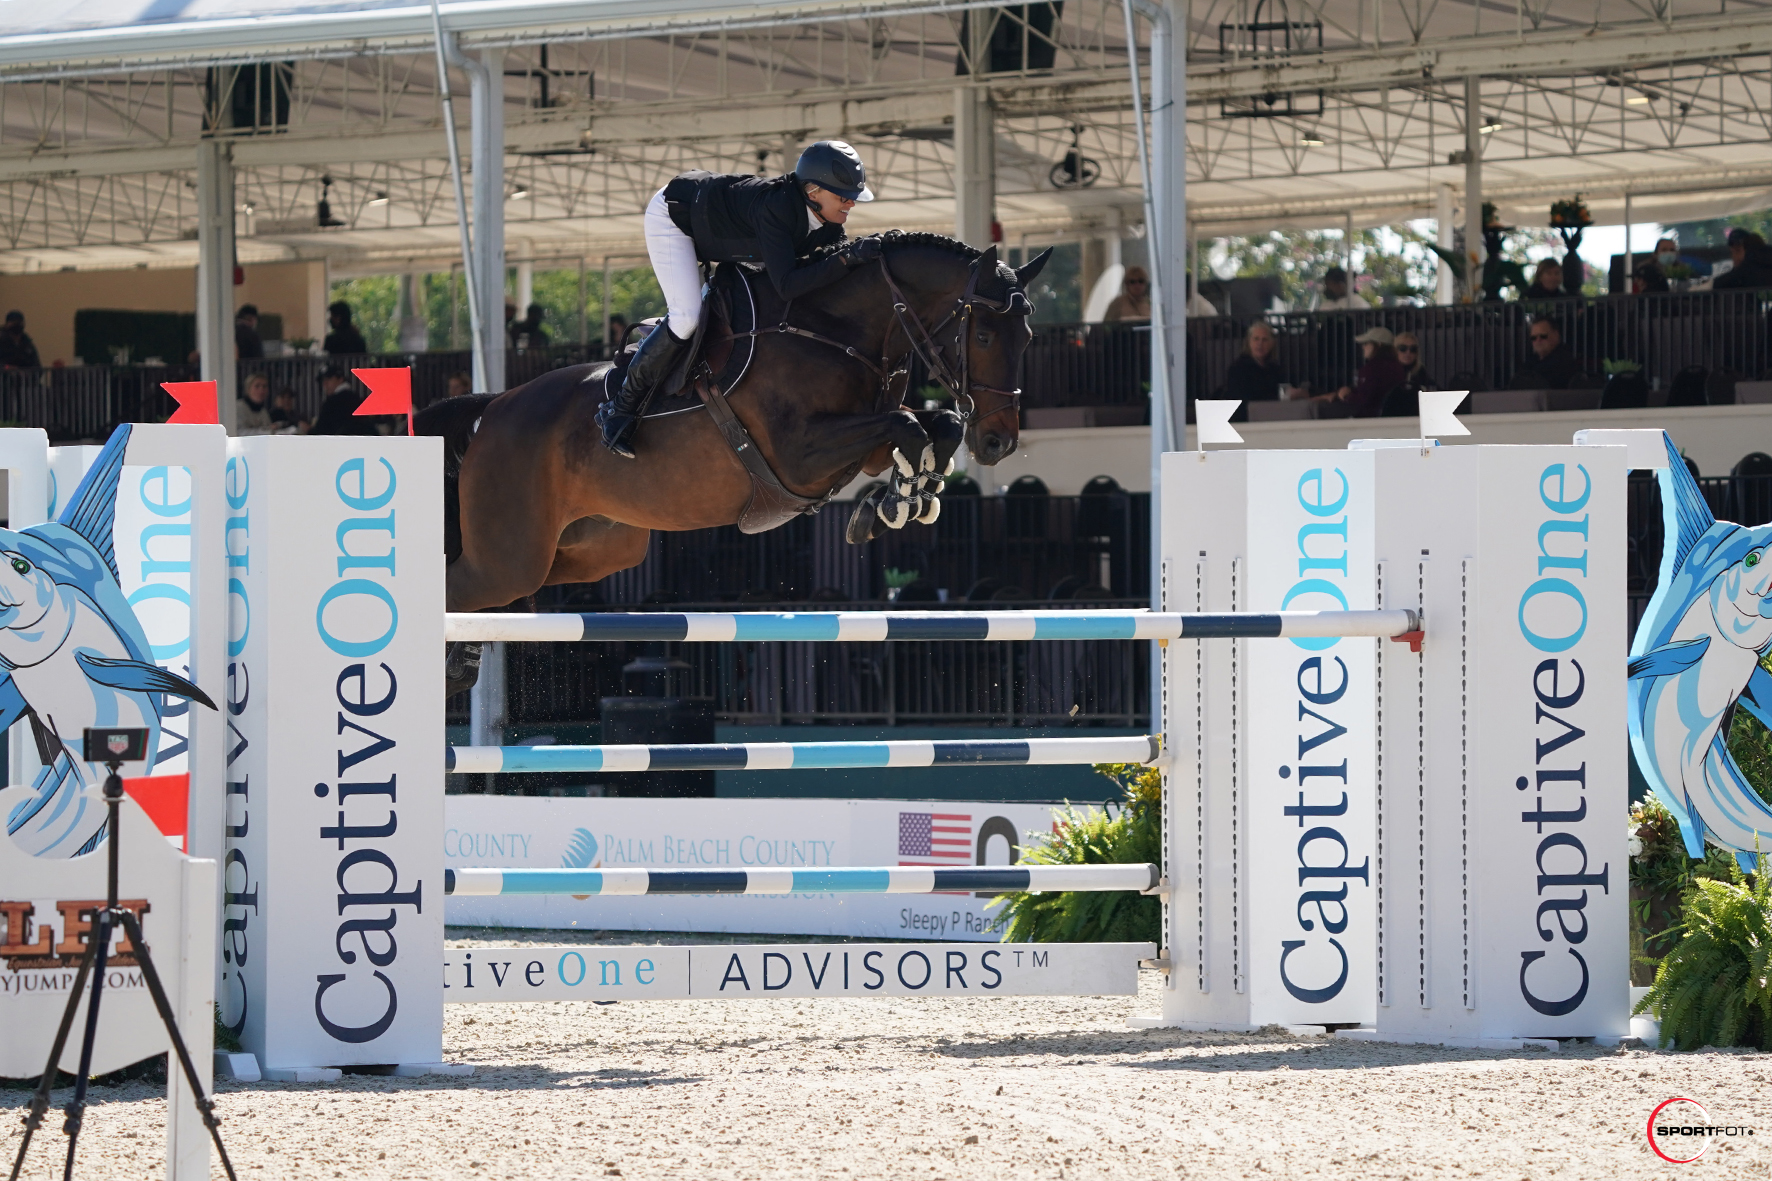 Erynn Ballard Scores Again in $25,000 CaptiveOne Advisors Classic